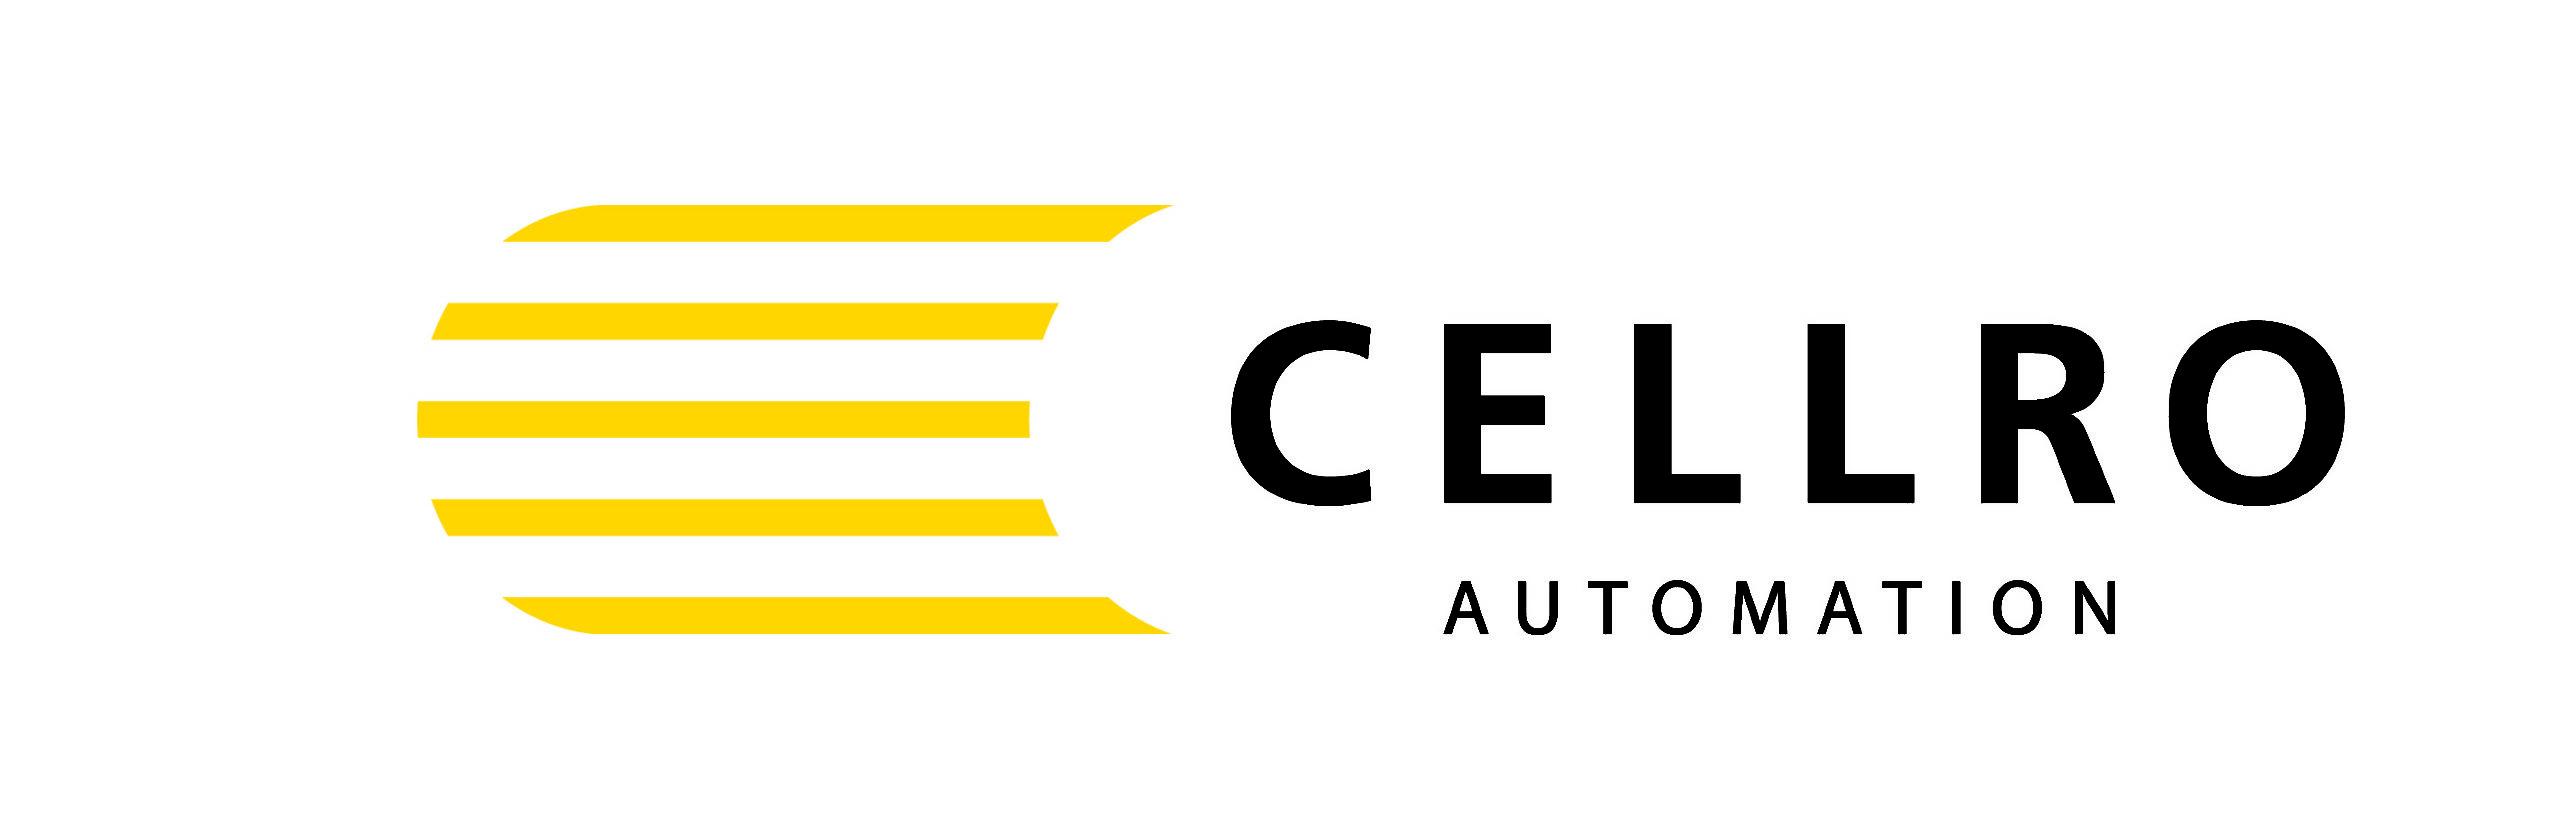 Cellro_logolabel links_incl subtitle_CMYK